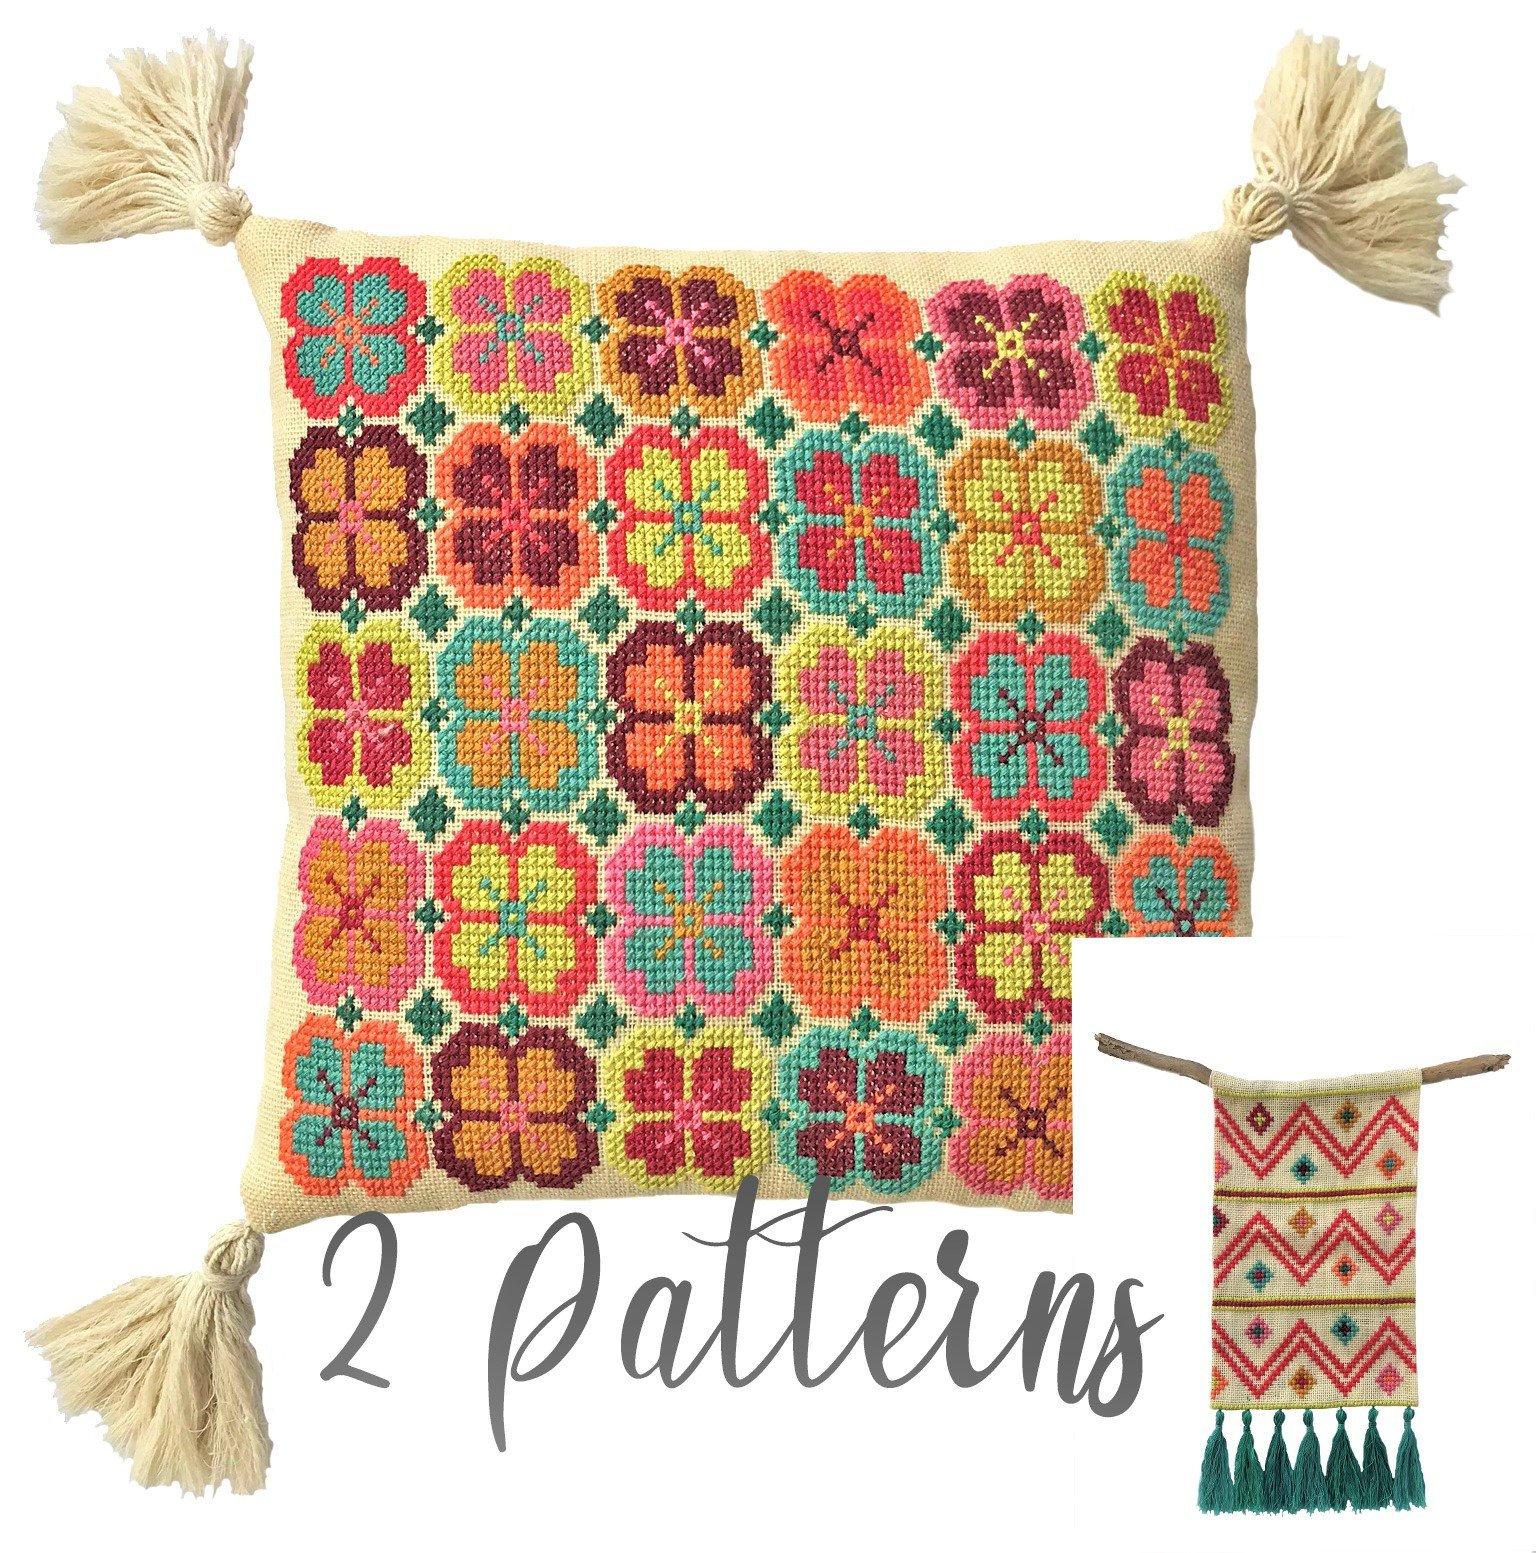 Bohemian Embroidery Patterns Bohemian Cross Stitch Pattern Diy Embroidery Cushion Wall Hanging Boho Inspired Needlework Pdf Instant Download Bundle 2 Patterns